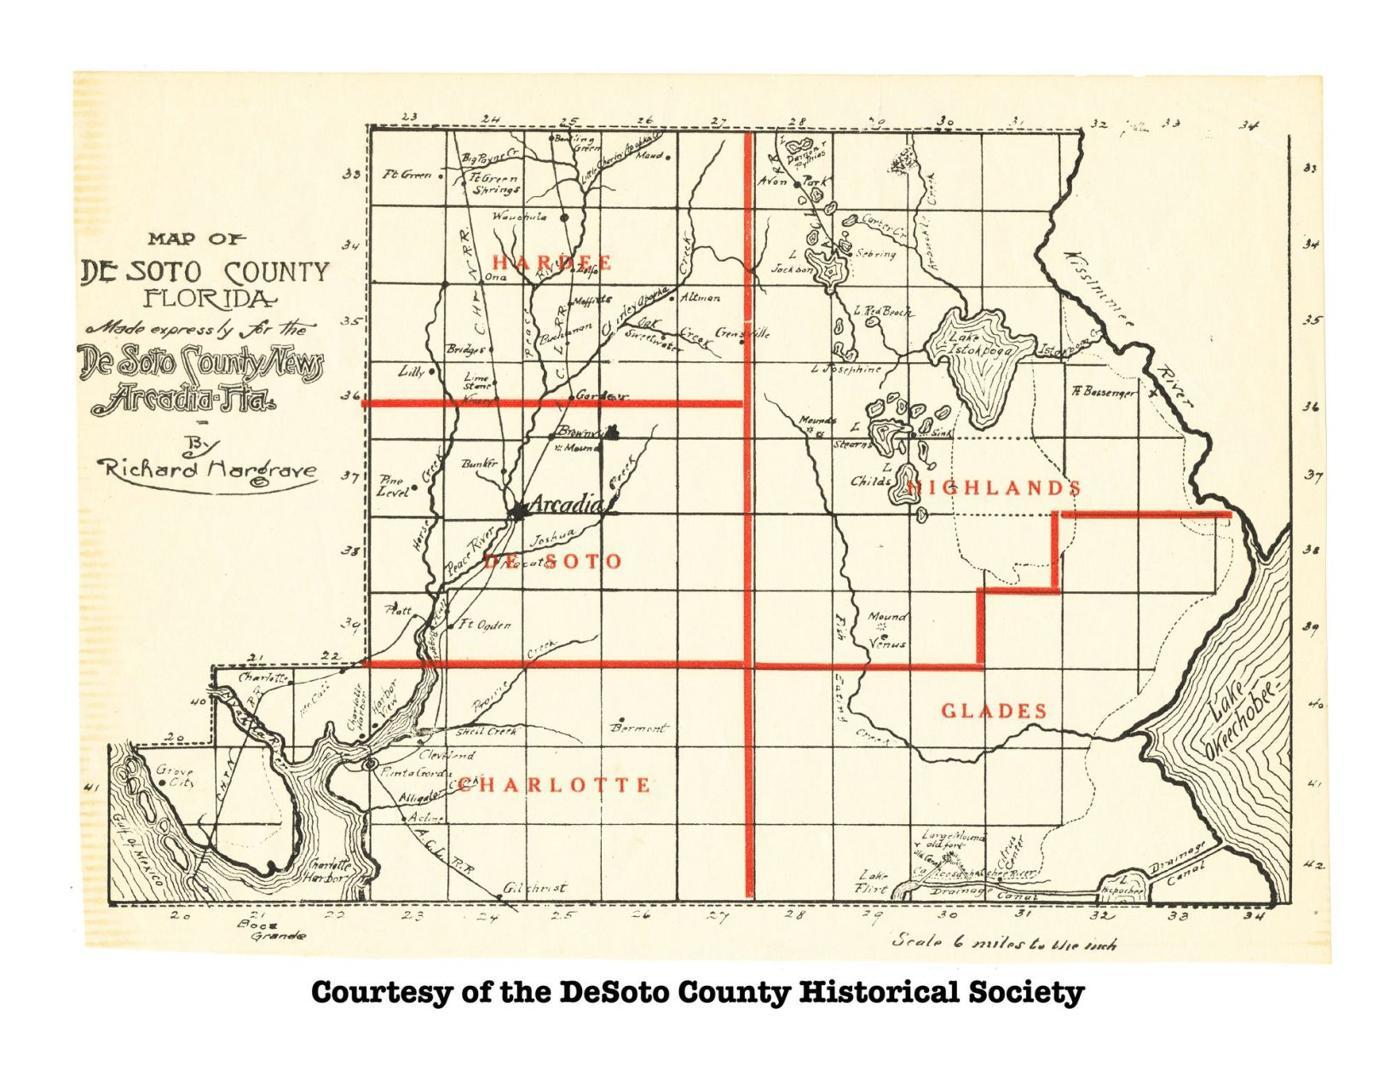 1921 DeSoto County Division Map